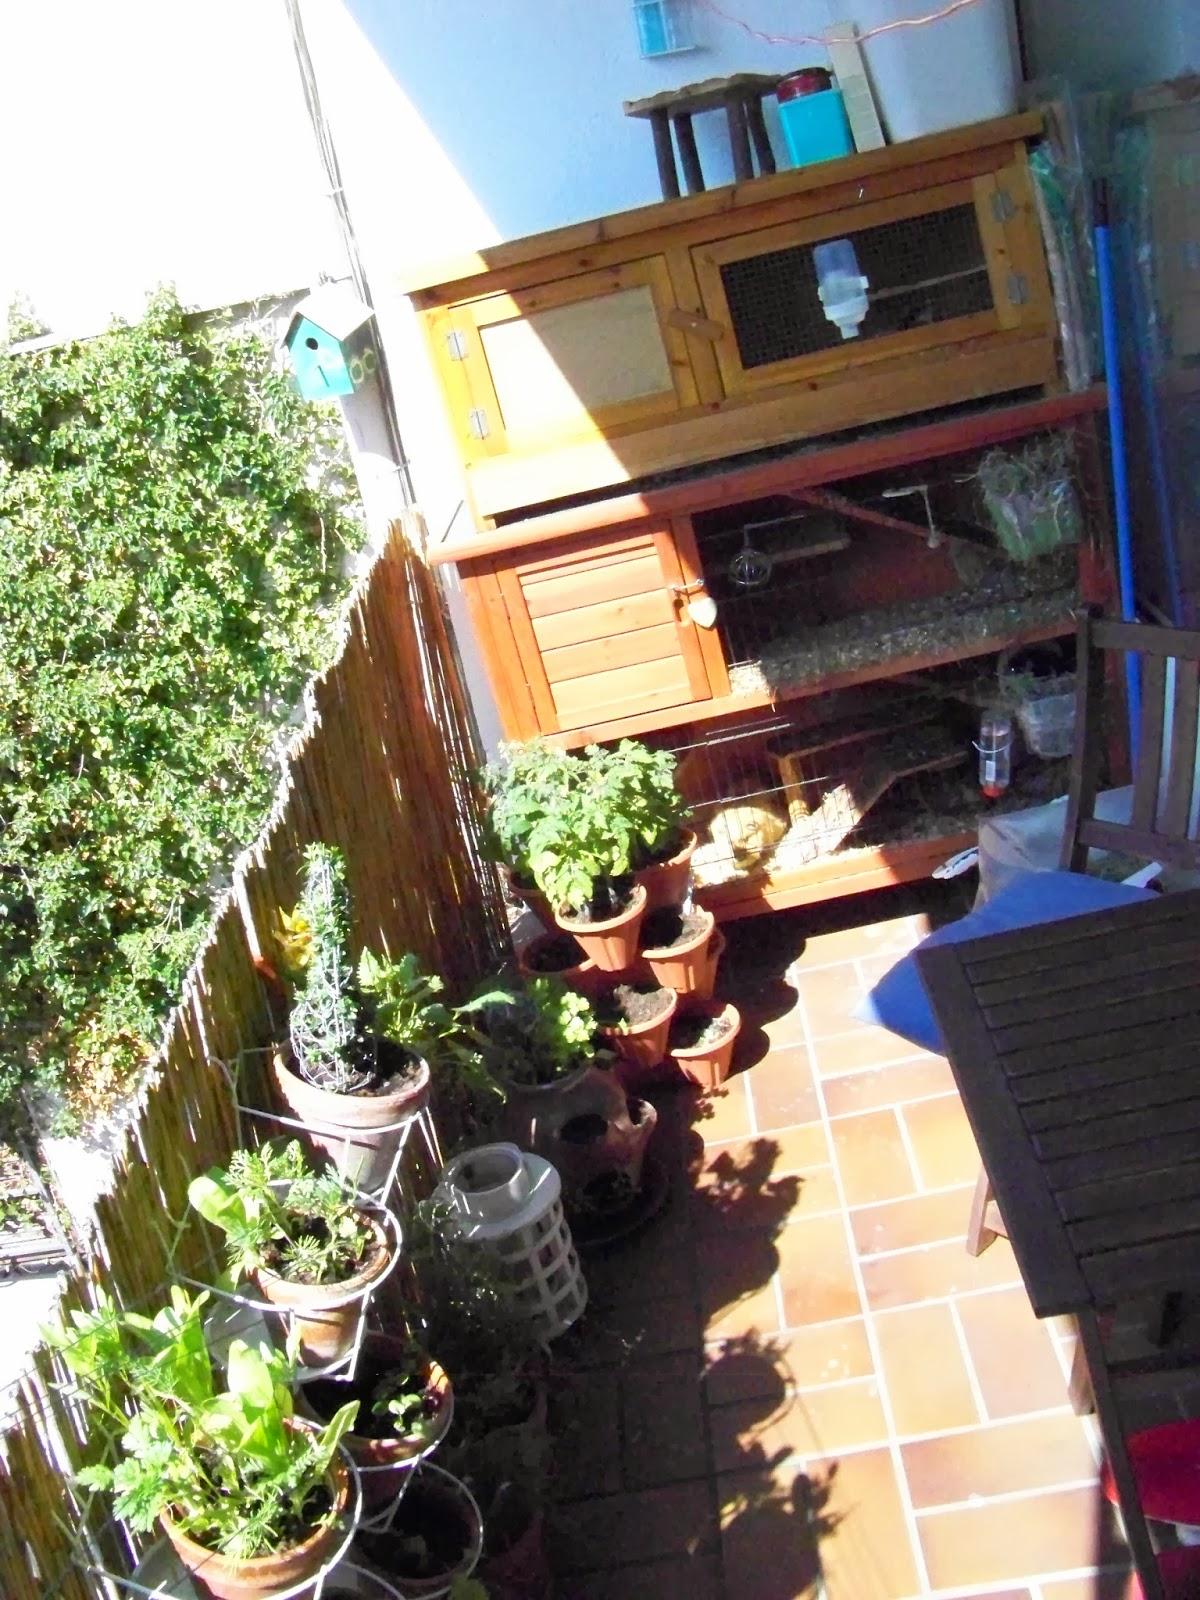 fr uleins wunderbare welt letzte ernte aufm balkon. Black Bedroom Furniture Sets. Home Design Ideas